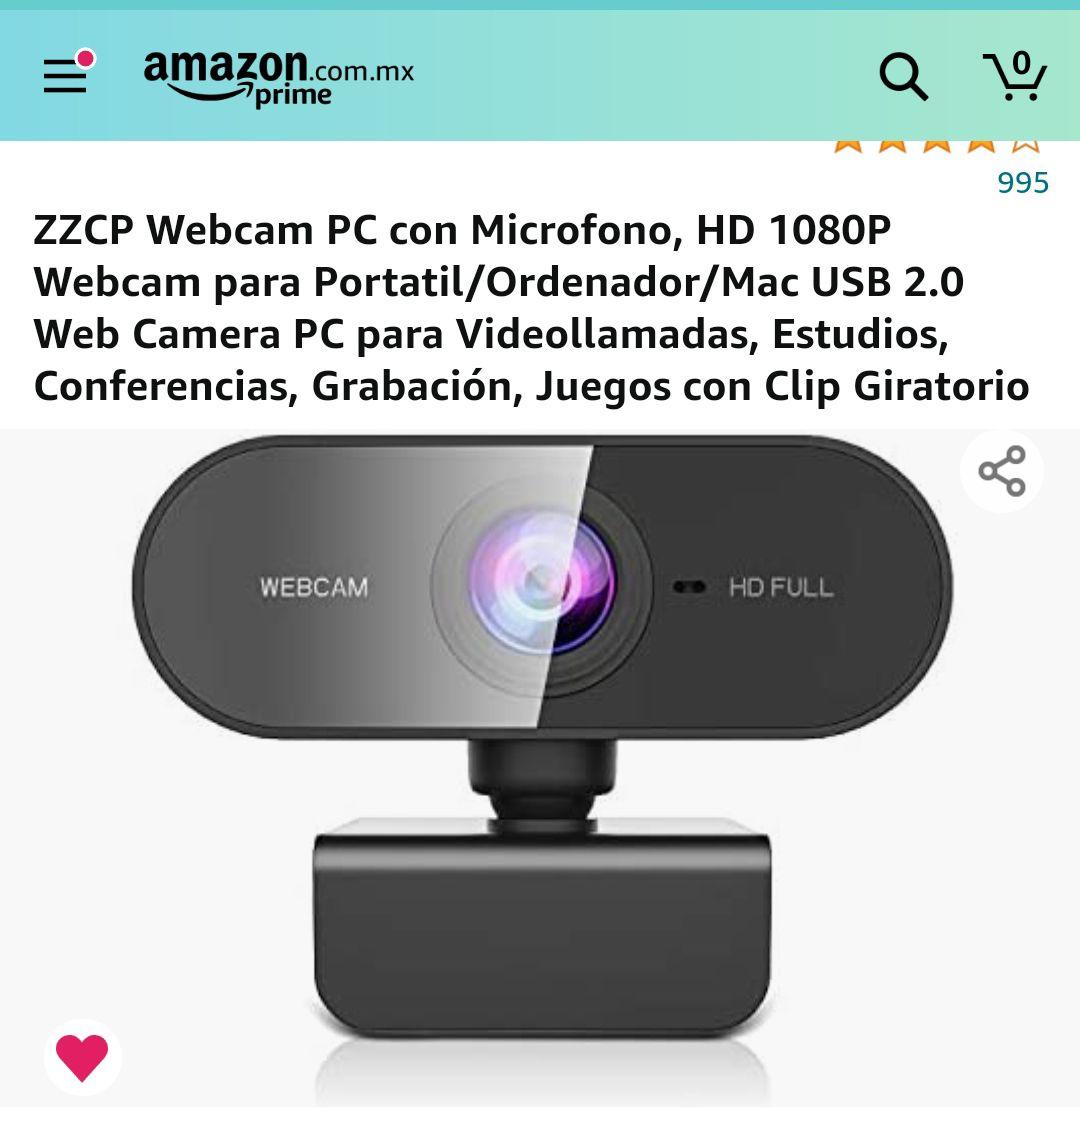 Amazon: Camara web full HD a 1080p, marca ZZCP